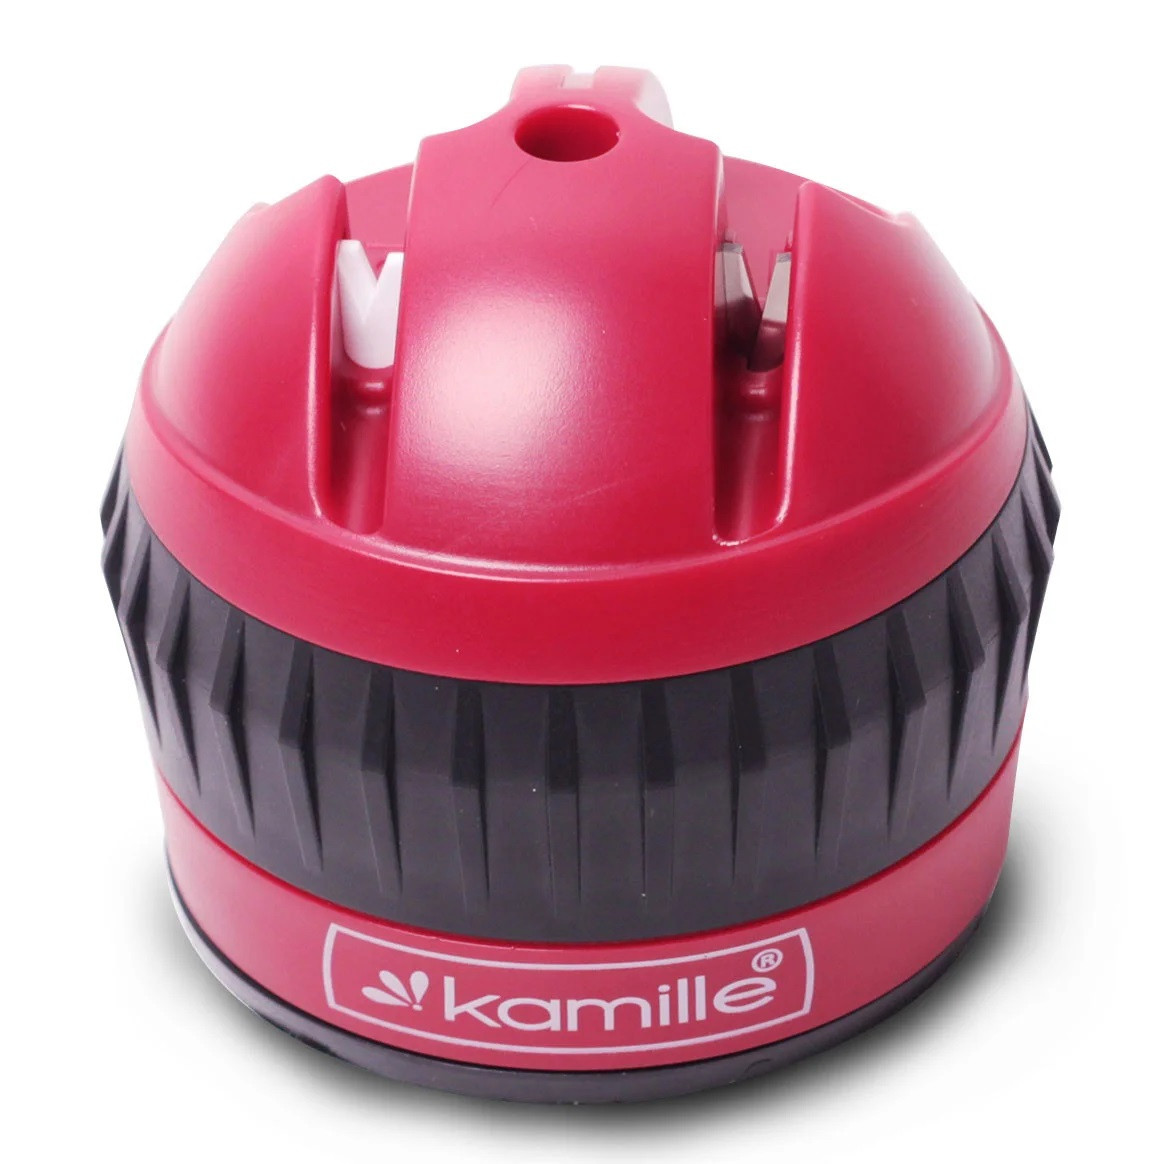 Точилка для ножей Kamille круглая 6 х 6 х 6,5 см